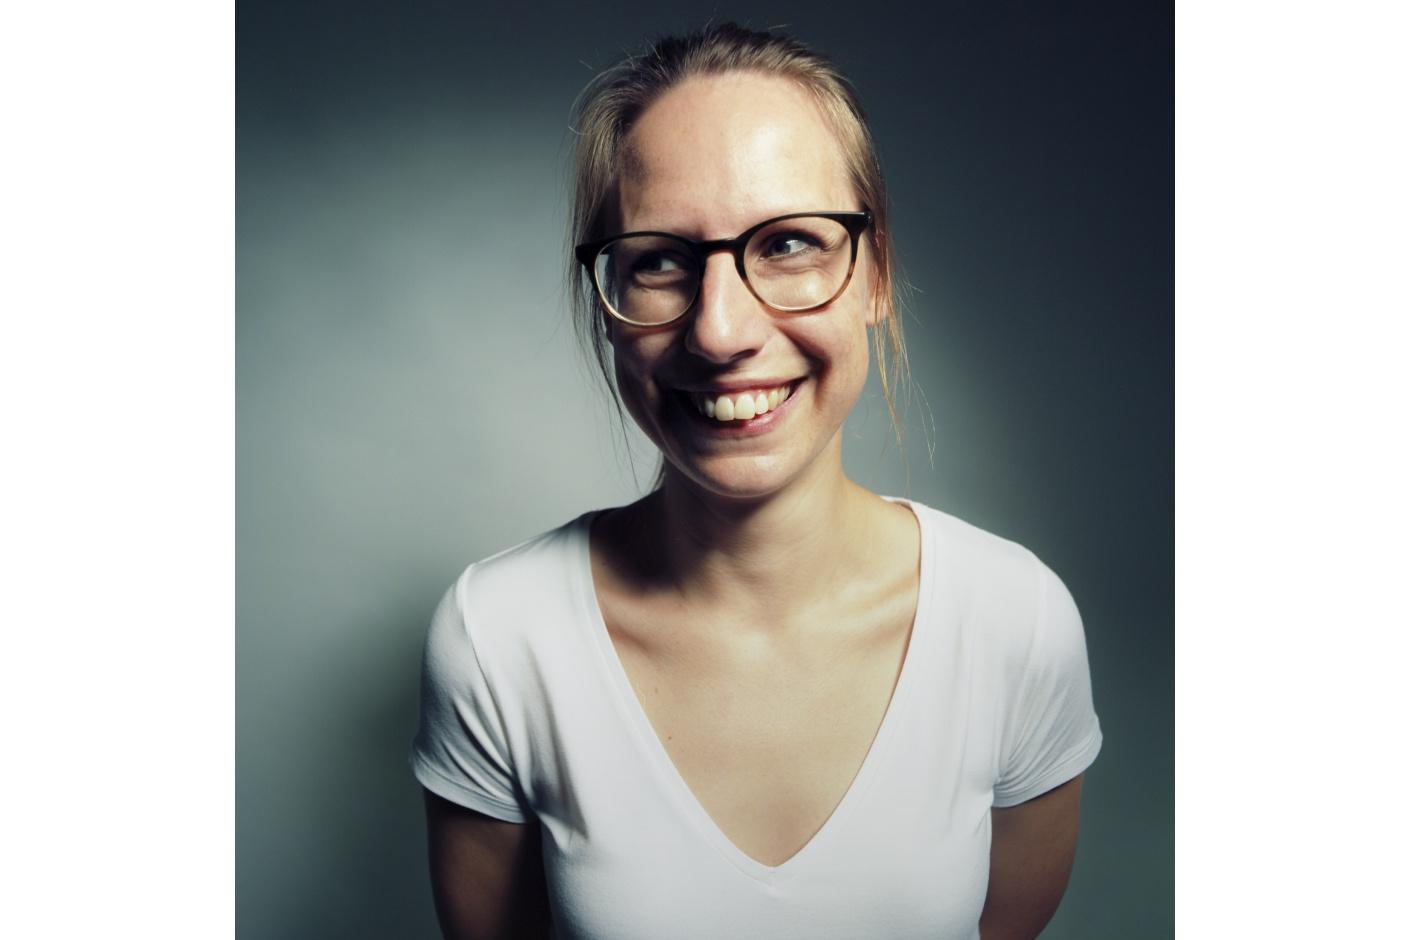 Jelle Pieter de Boer Hasselblad Photography Eveline